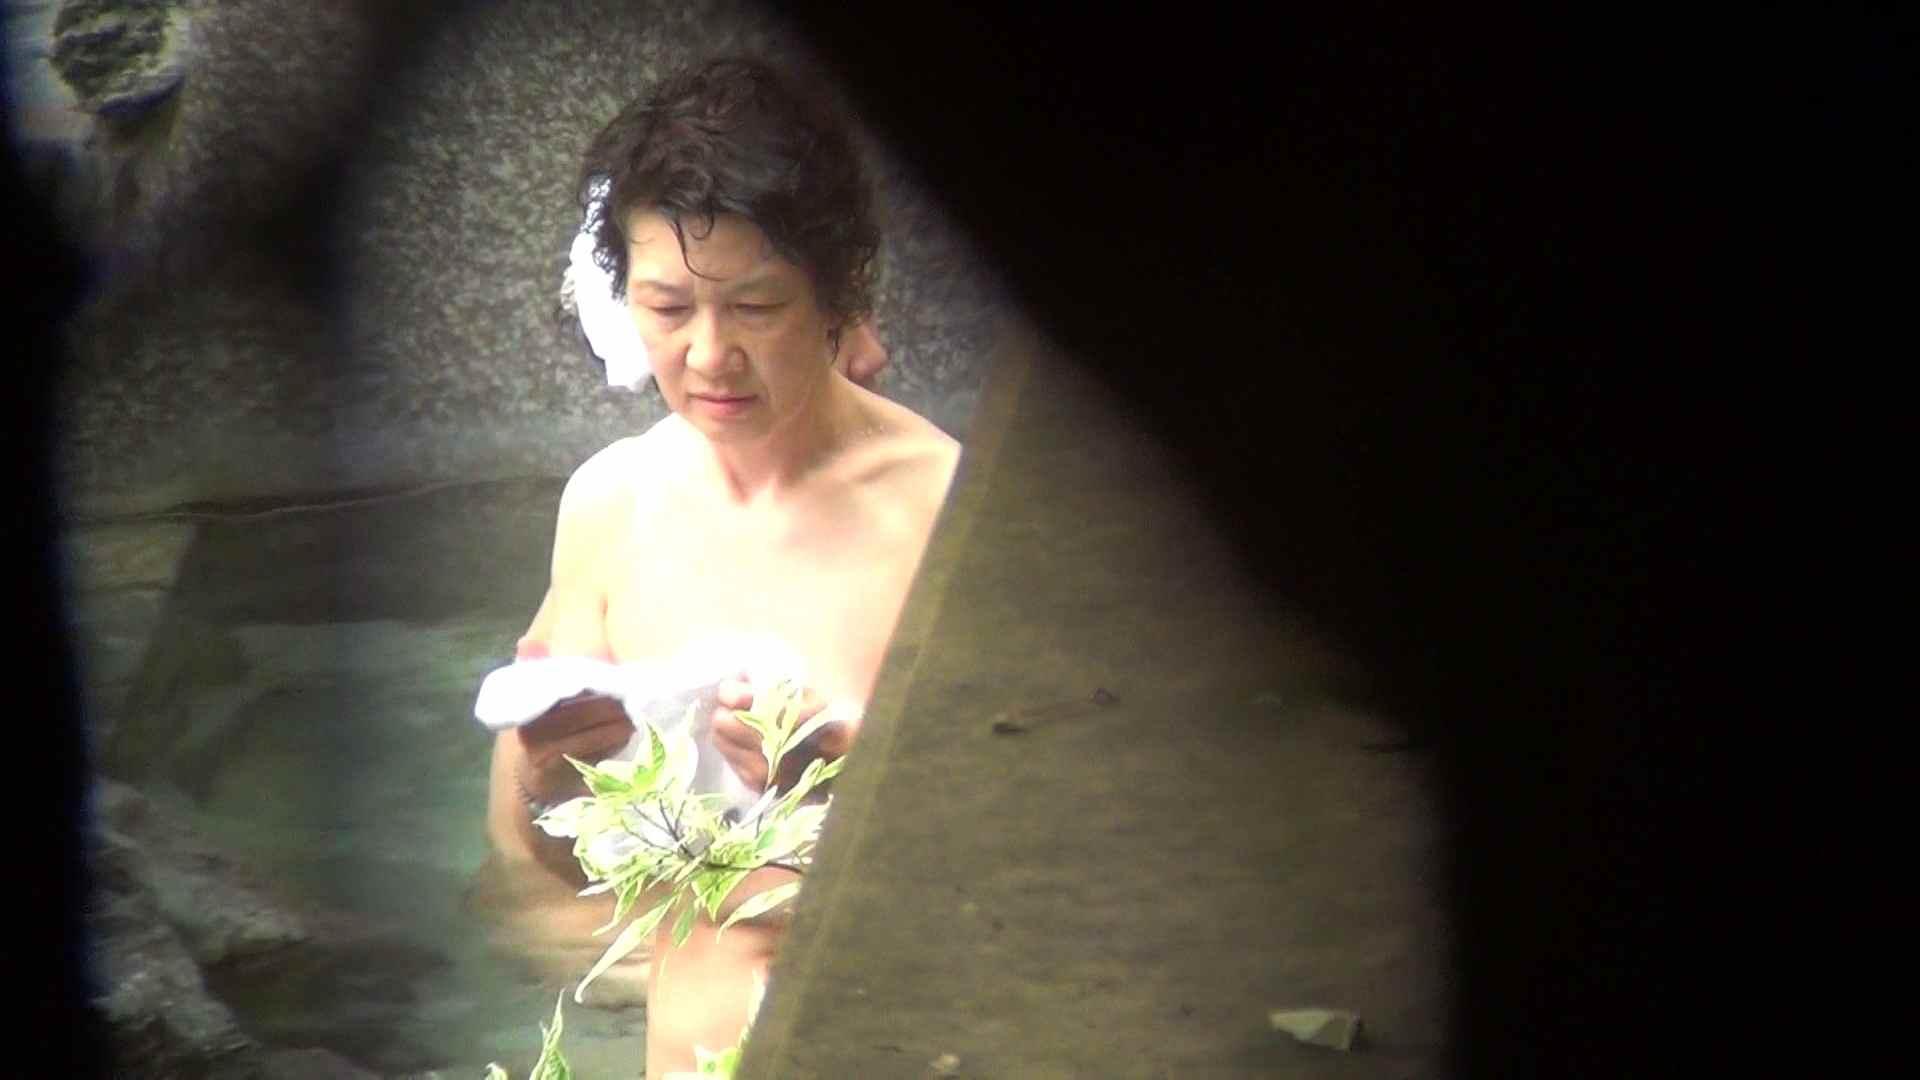 Aquaな露天風呂Vol.309 盗撮特撮  12pic 12